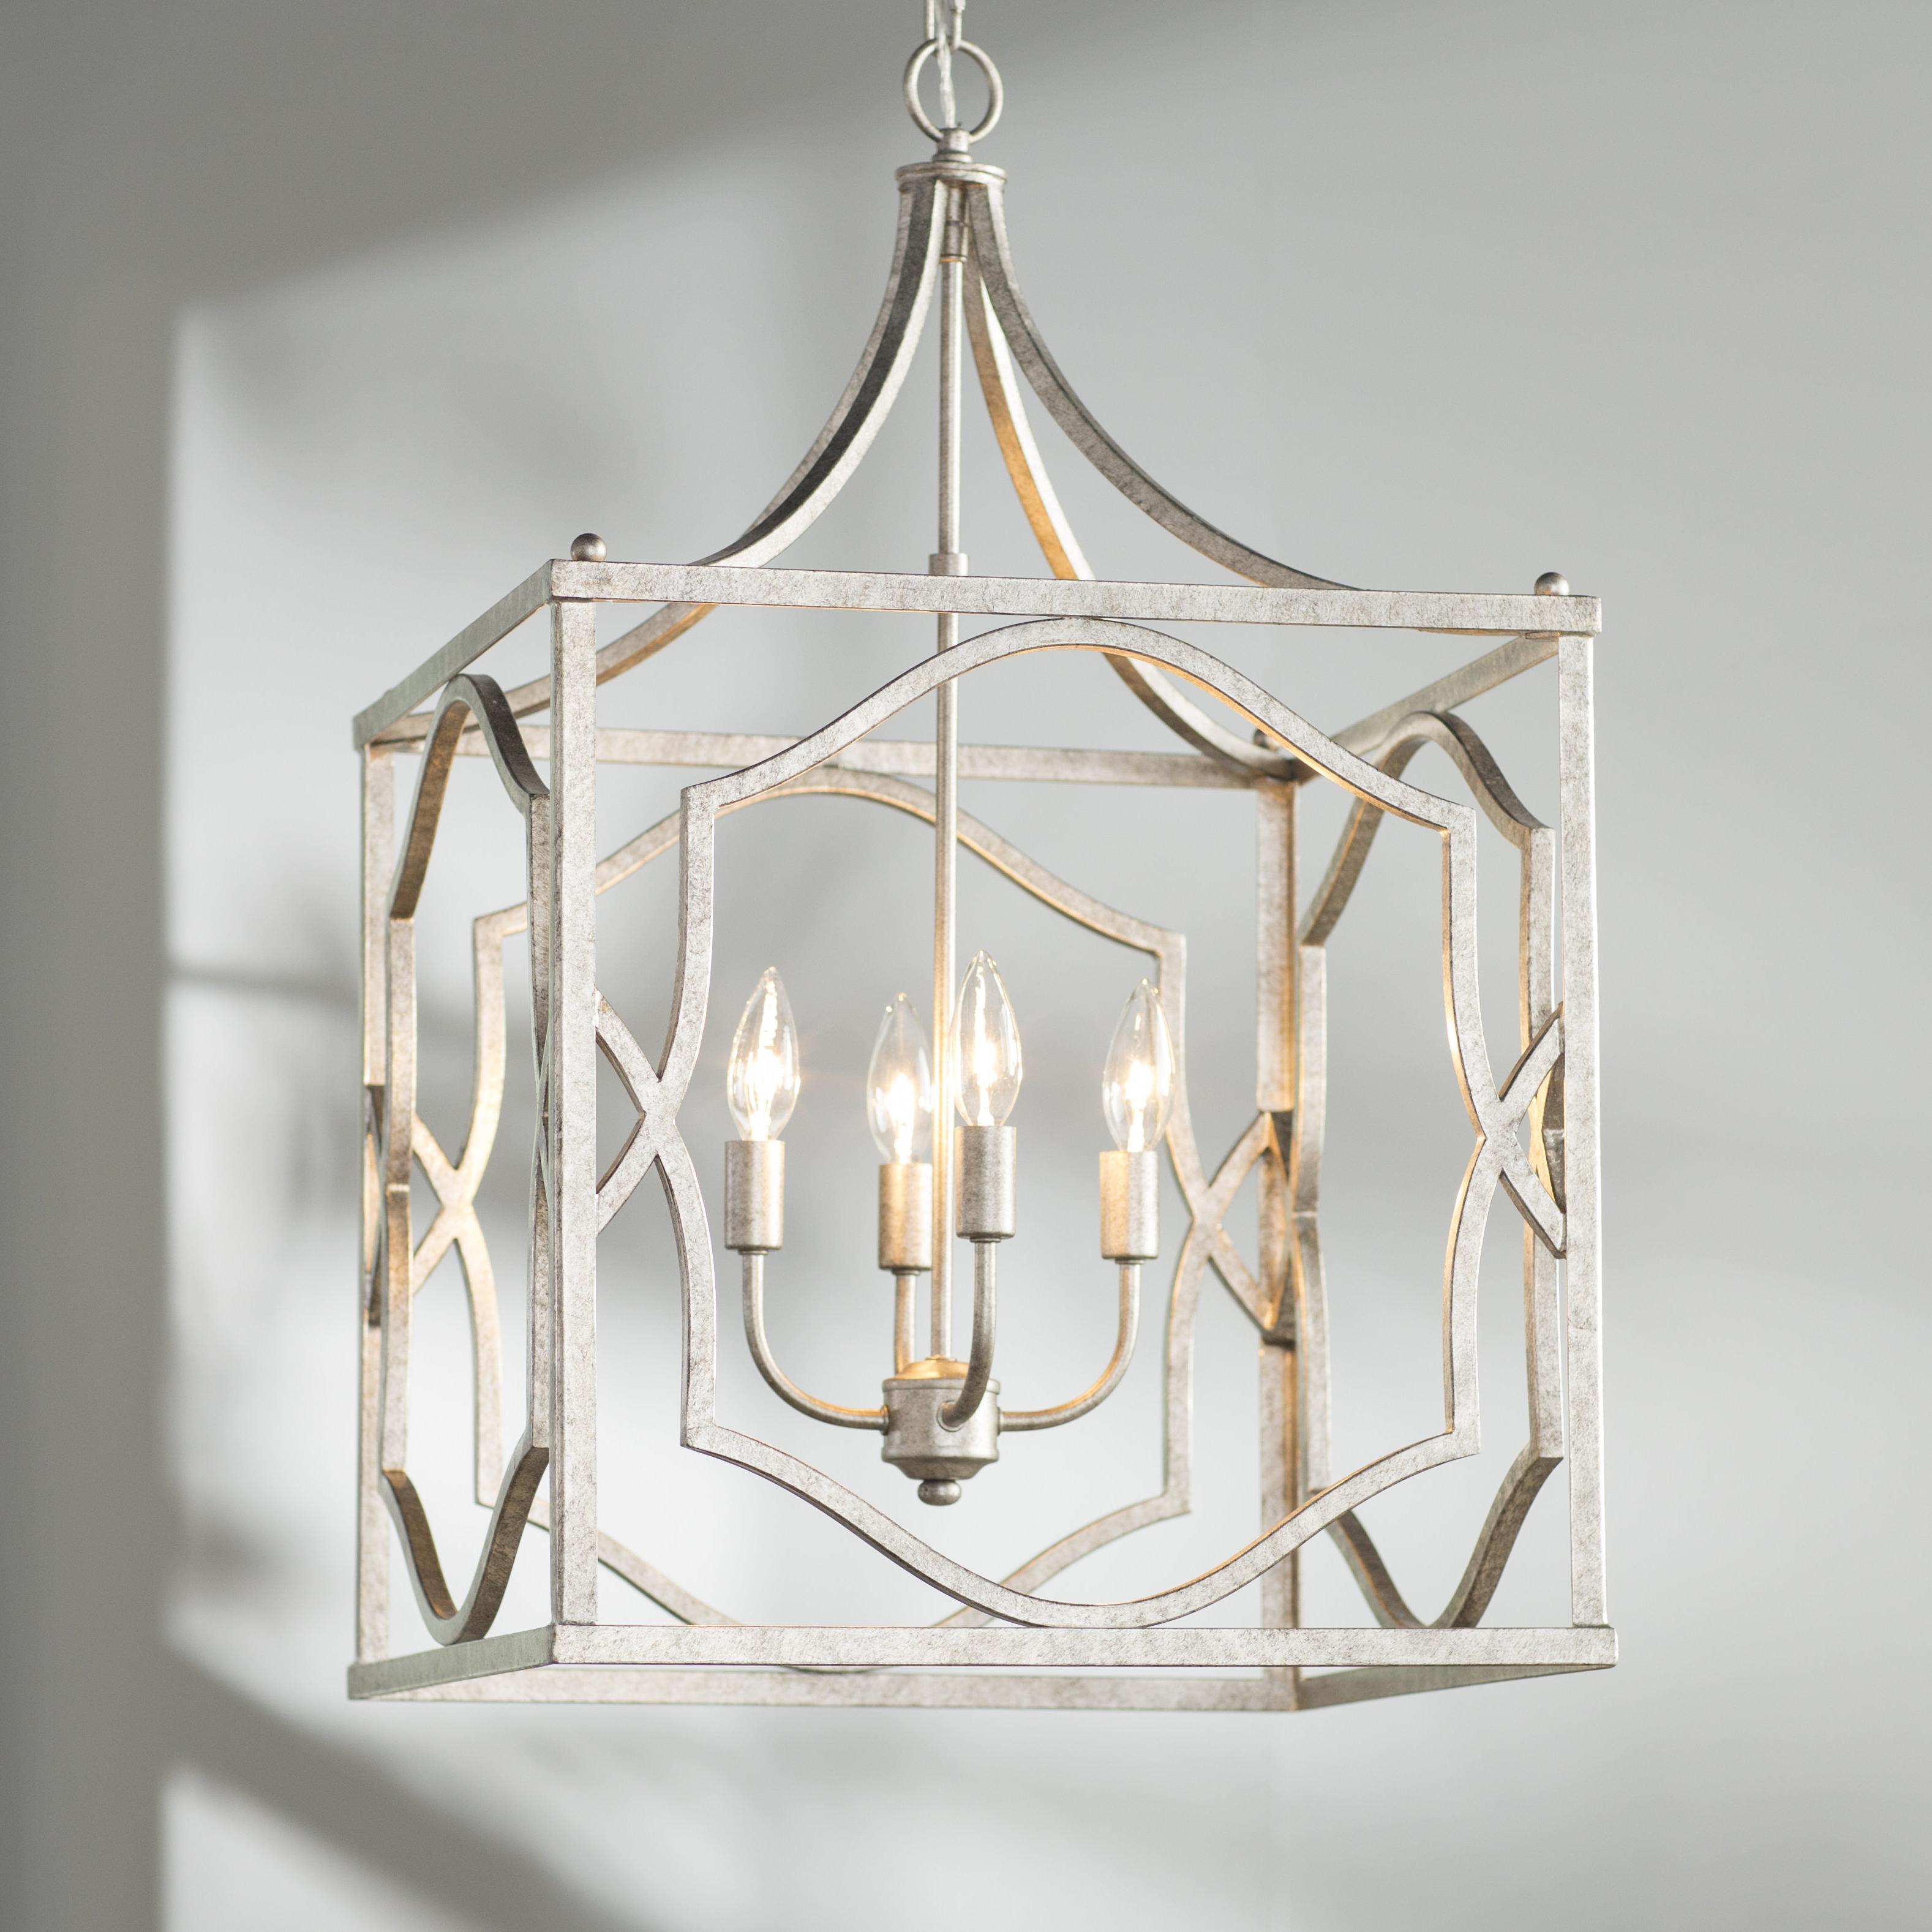 Freeburg 4 Light Lantern Square / Rectangle Pendants Throughout Most Popular Destrey 4 Light Lantern Square / Rectangle Pendant (Gallery 3 of 20)